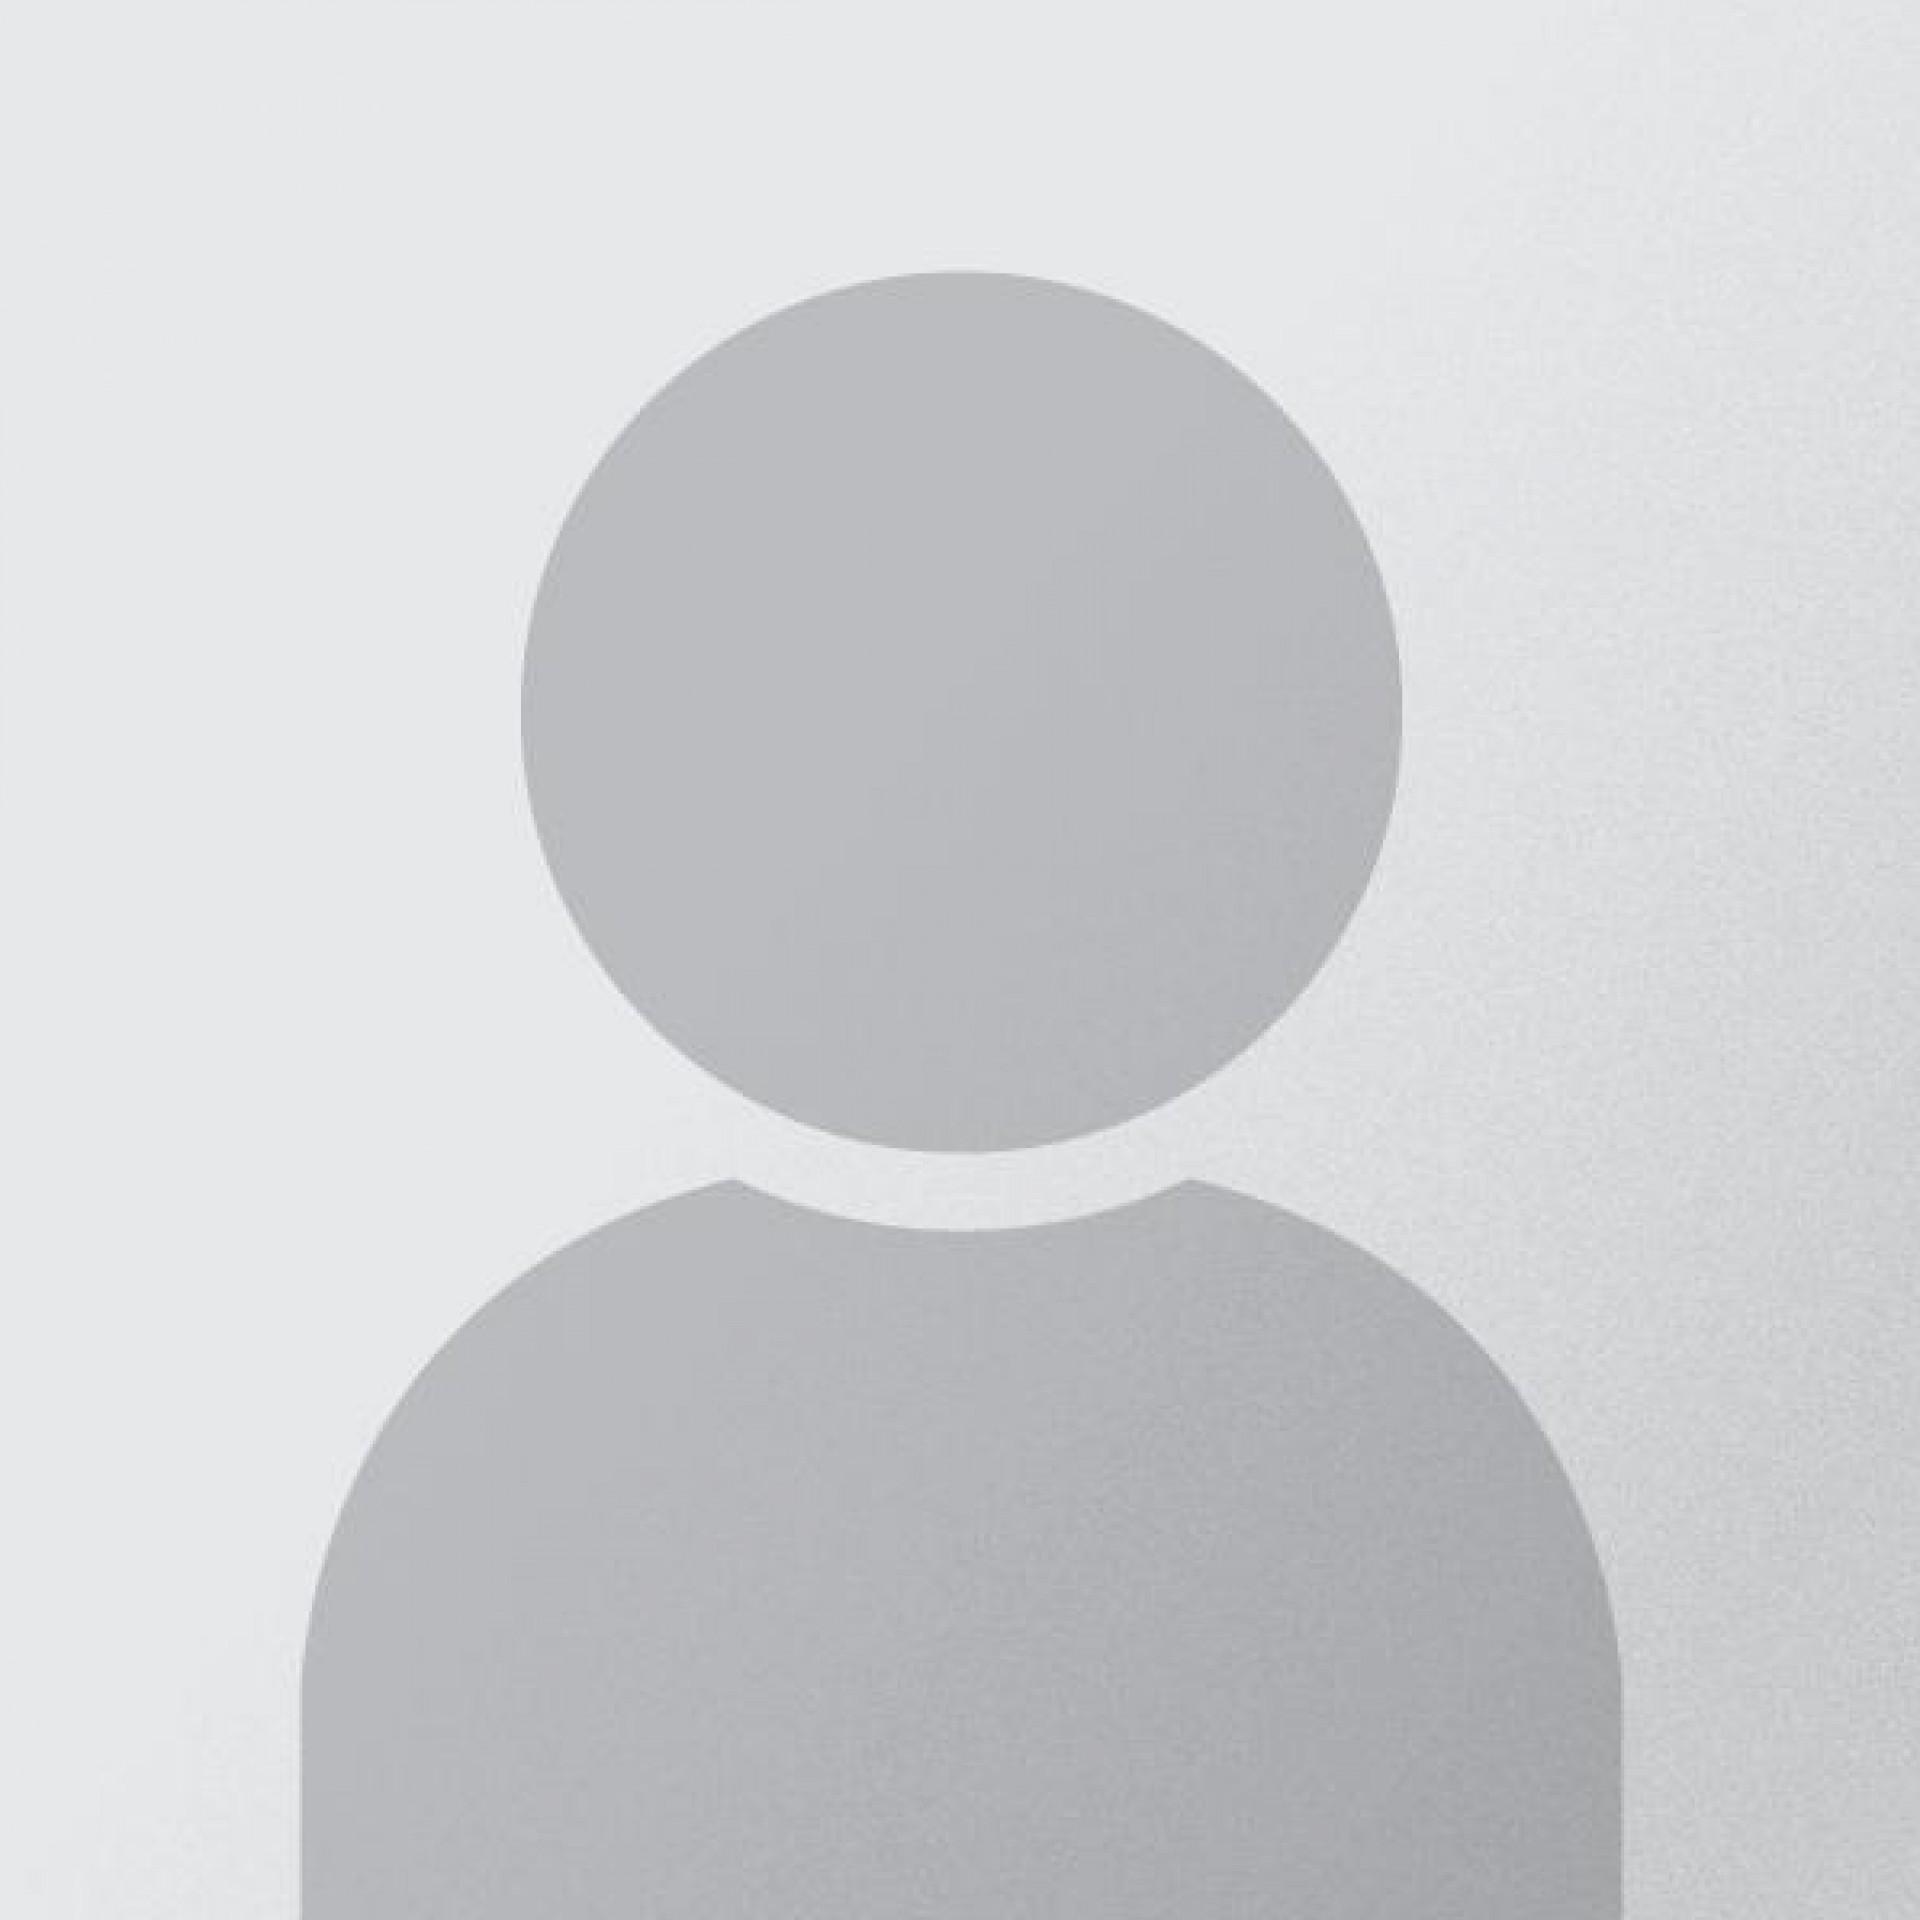 fotografia p021 profilu 01020NAHYE